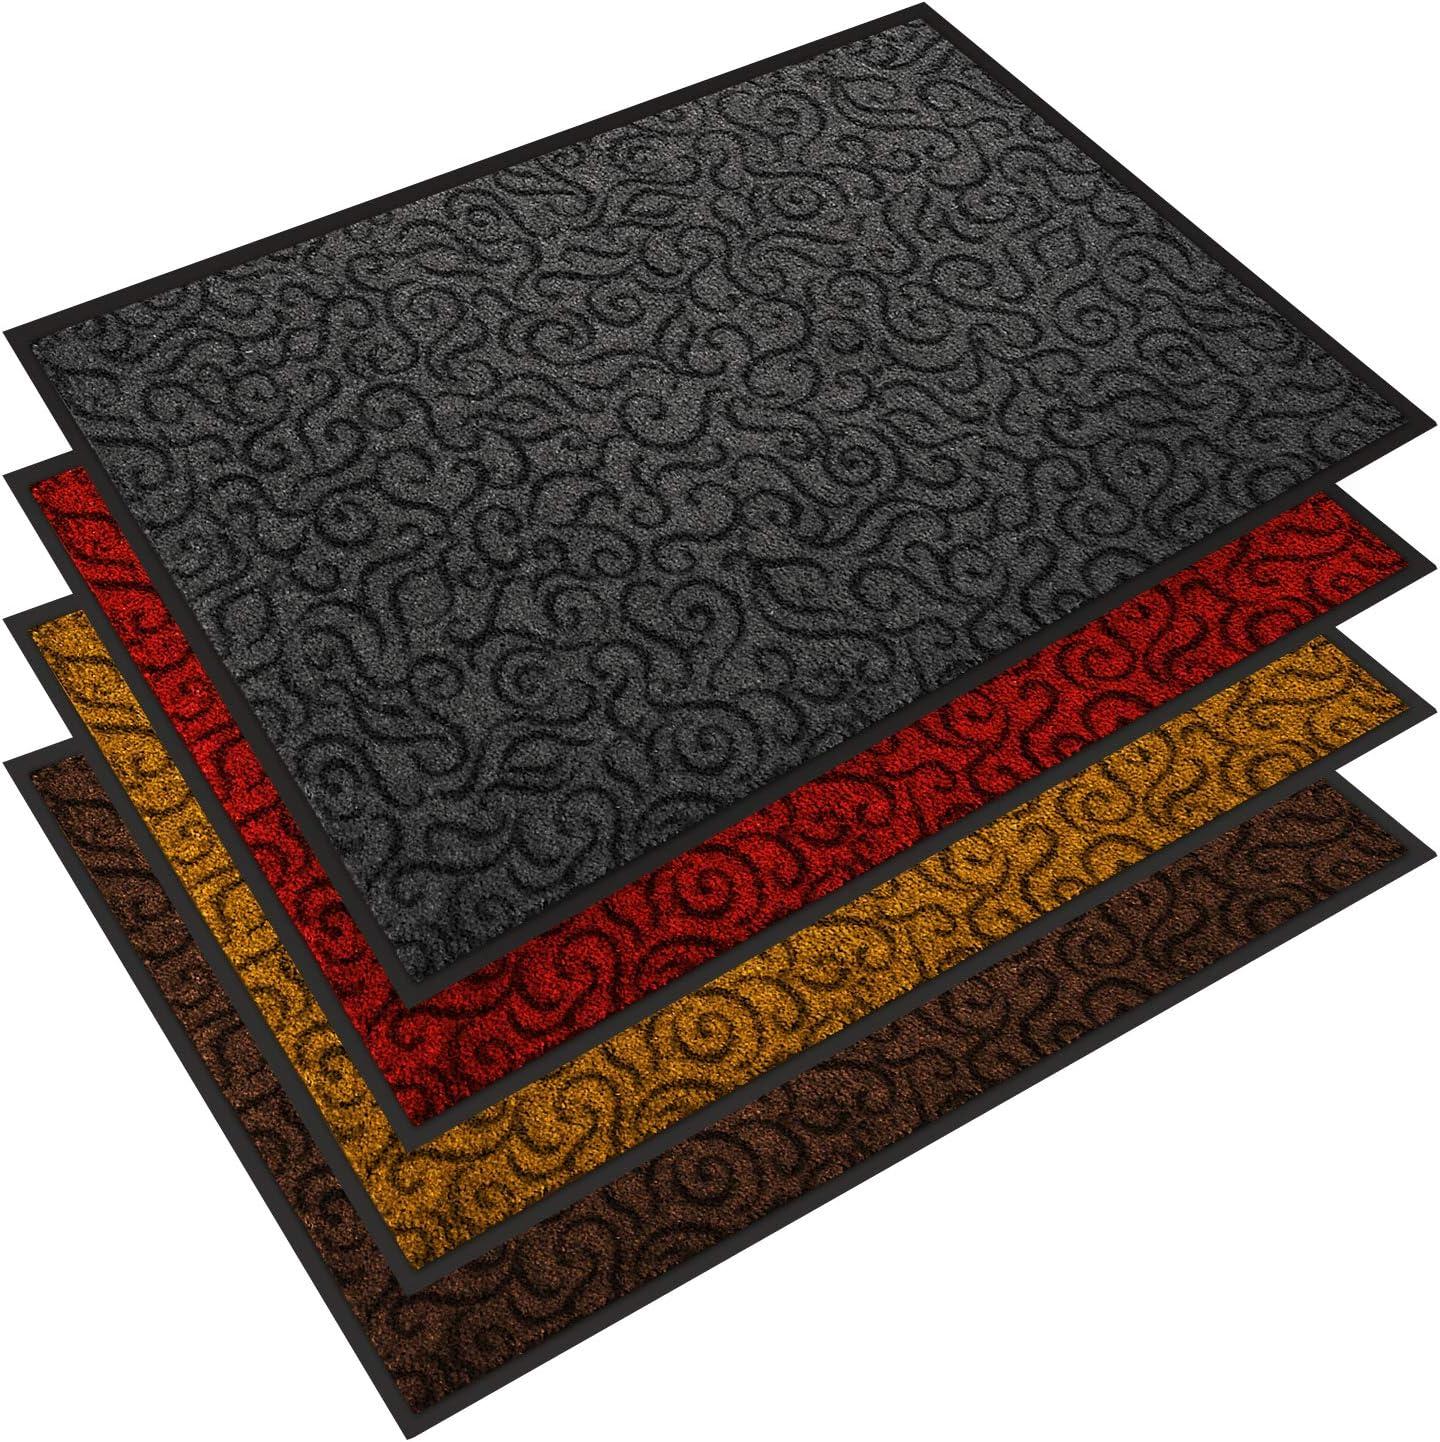 Design Eingangsmatte Bodenmatte Fußmatte Schmutzfangmatte 45x75x0,5 cm NEU TOP